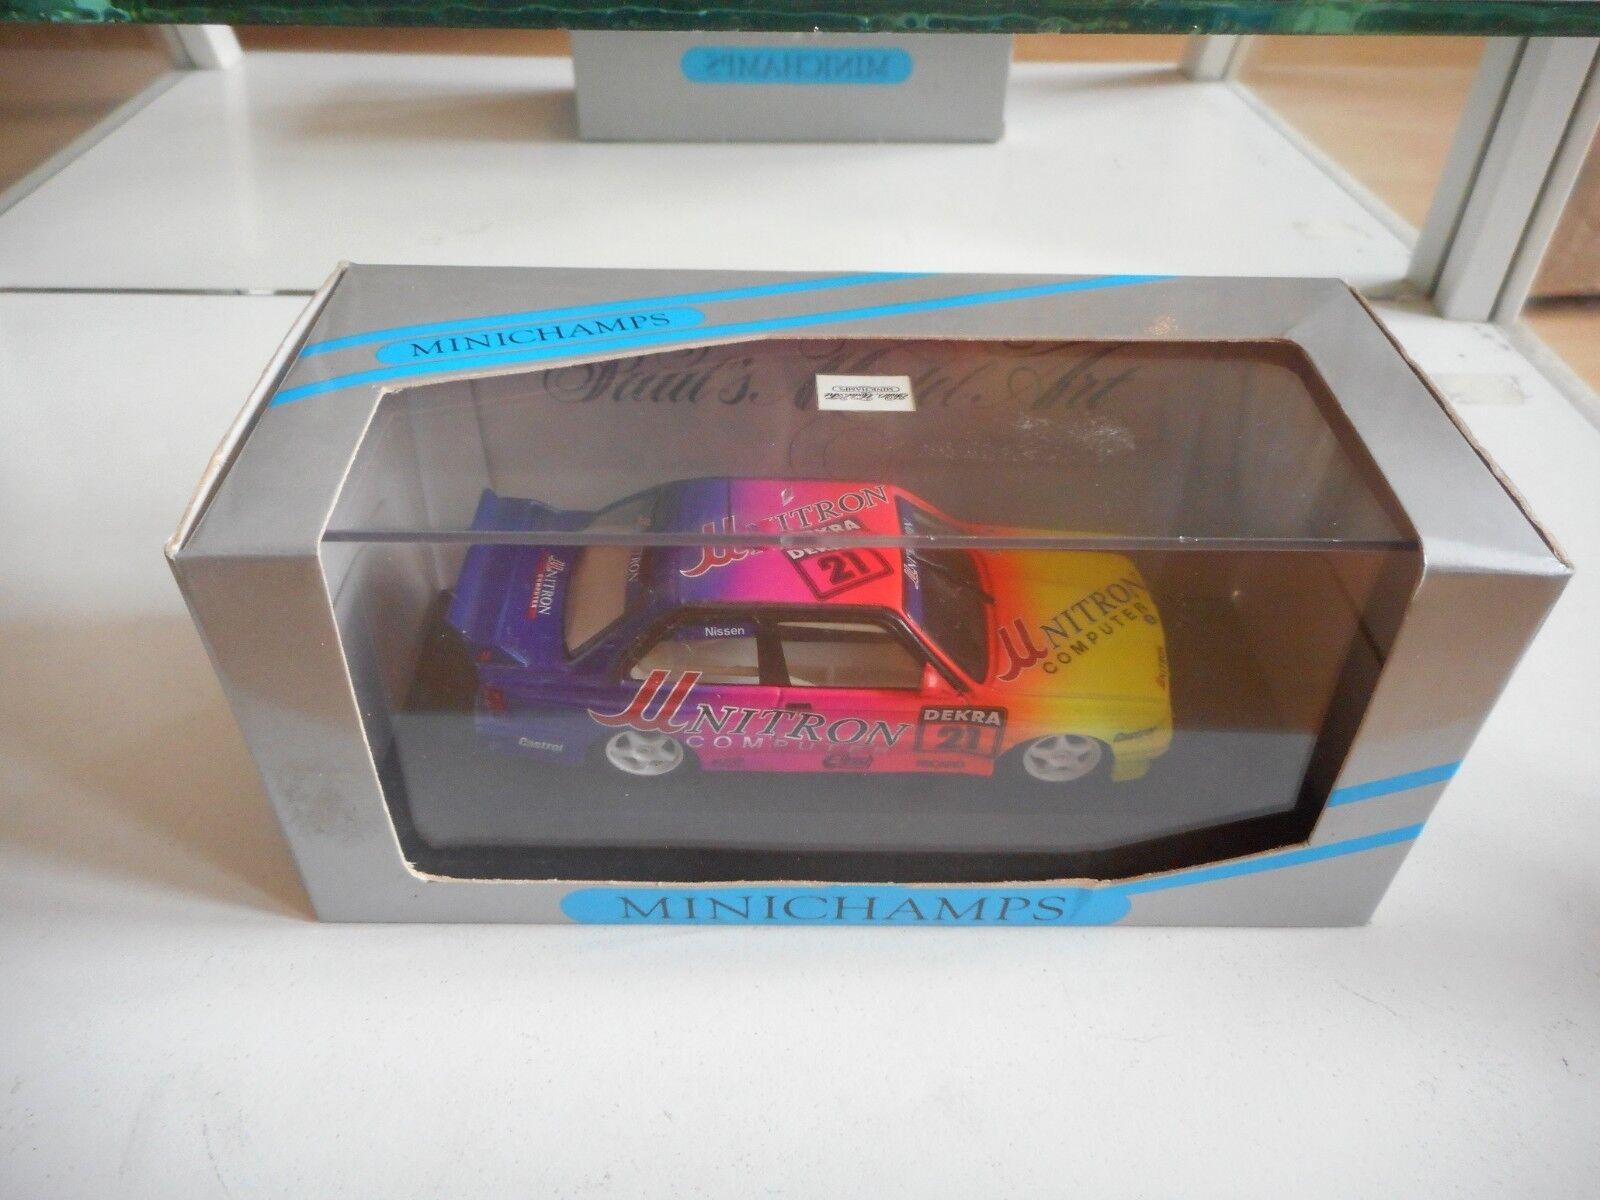 Minichamps BMW M3 DTM '92  21 Nissen In jaune violet on 1 43 in Box